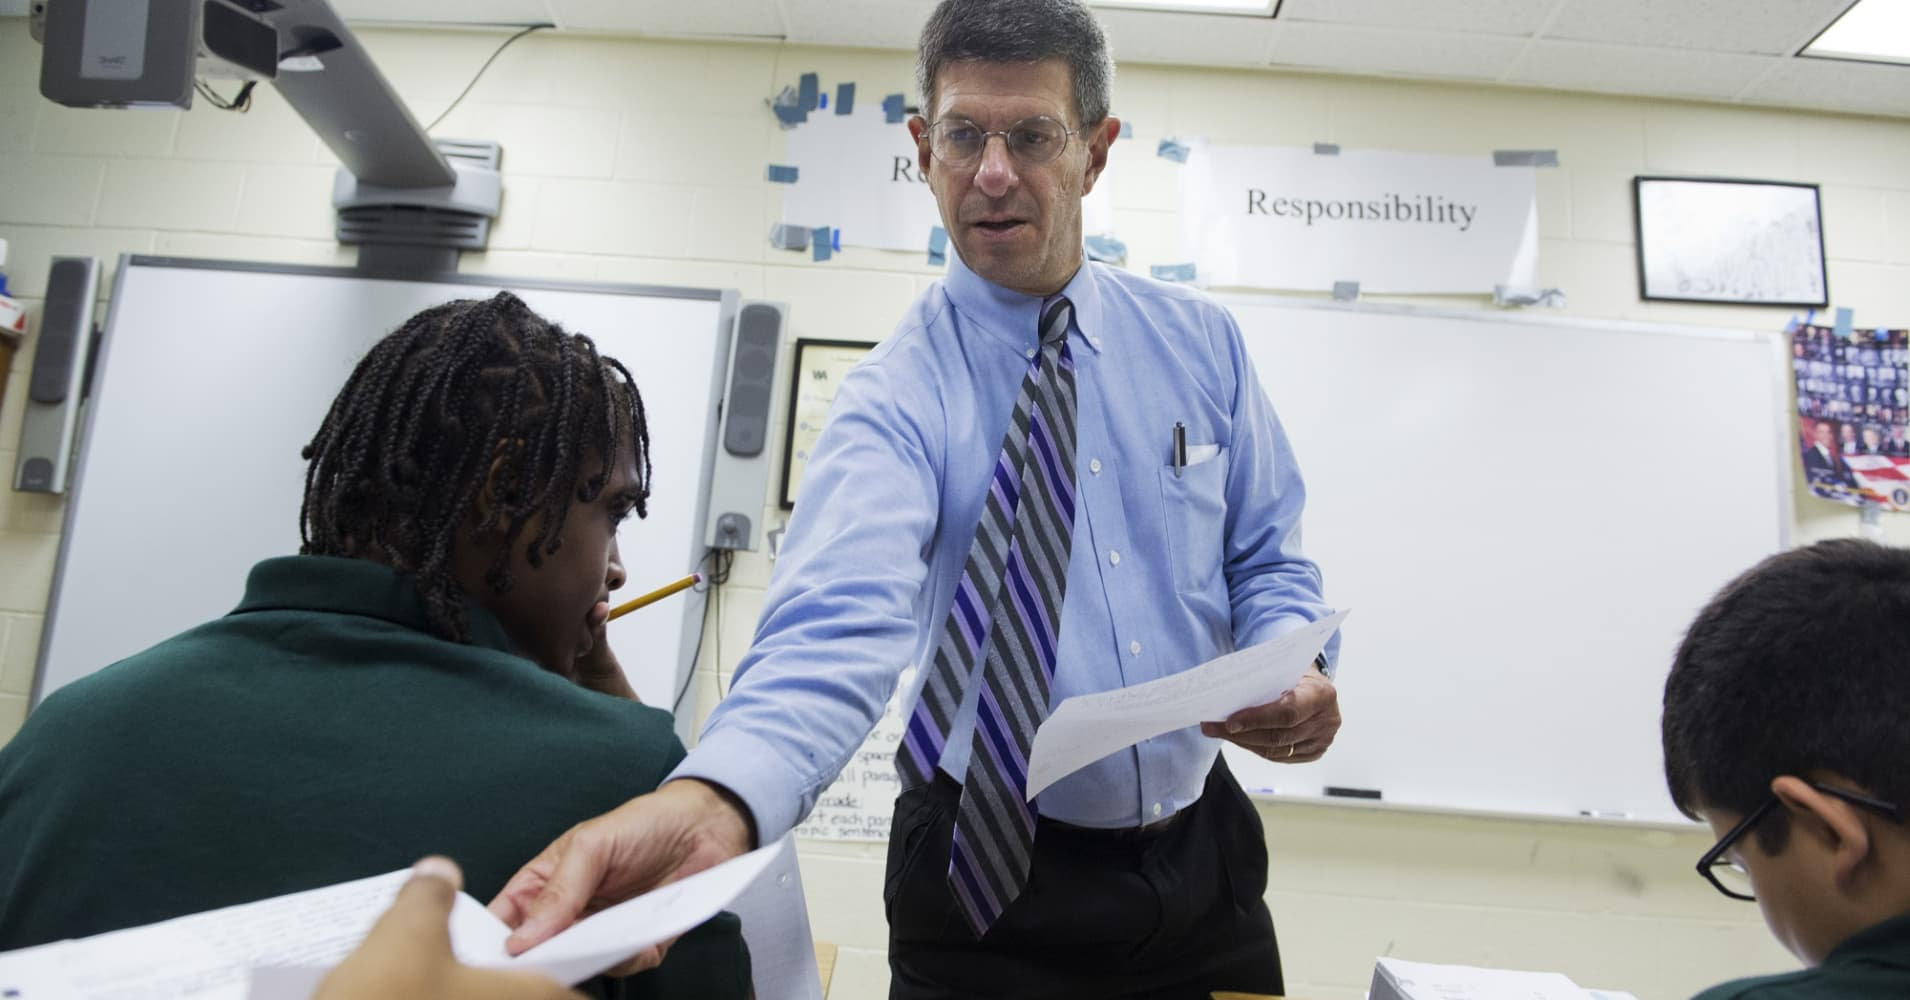 A social studies teacher in Washington D.C.